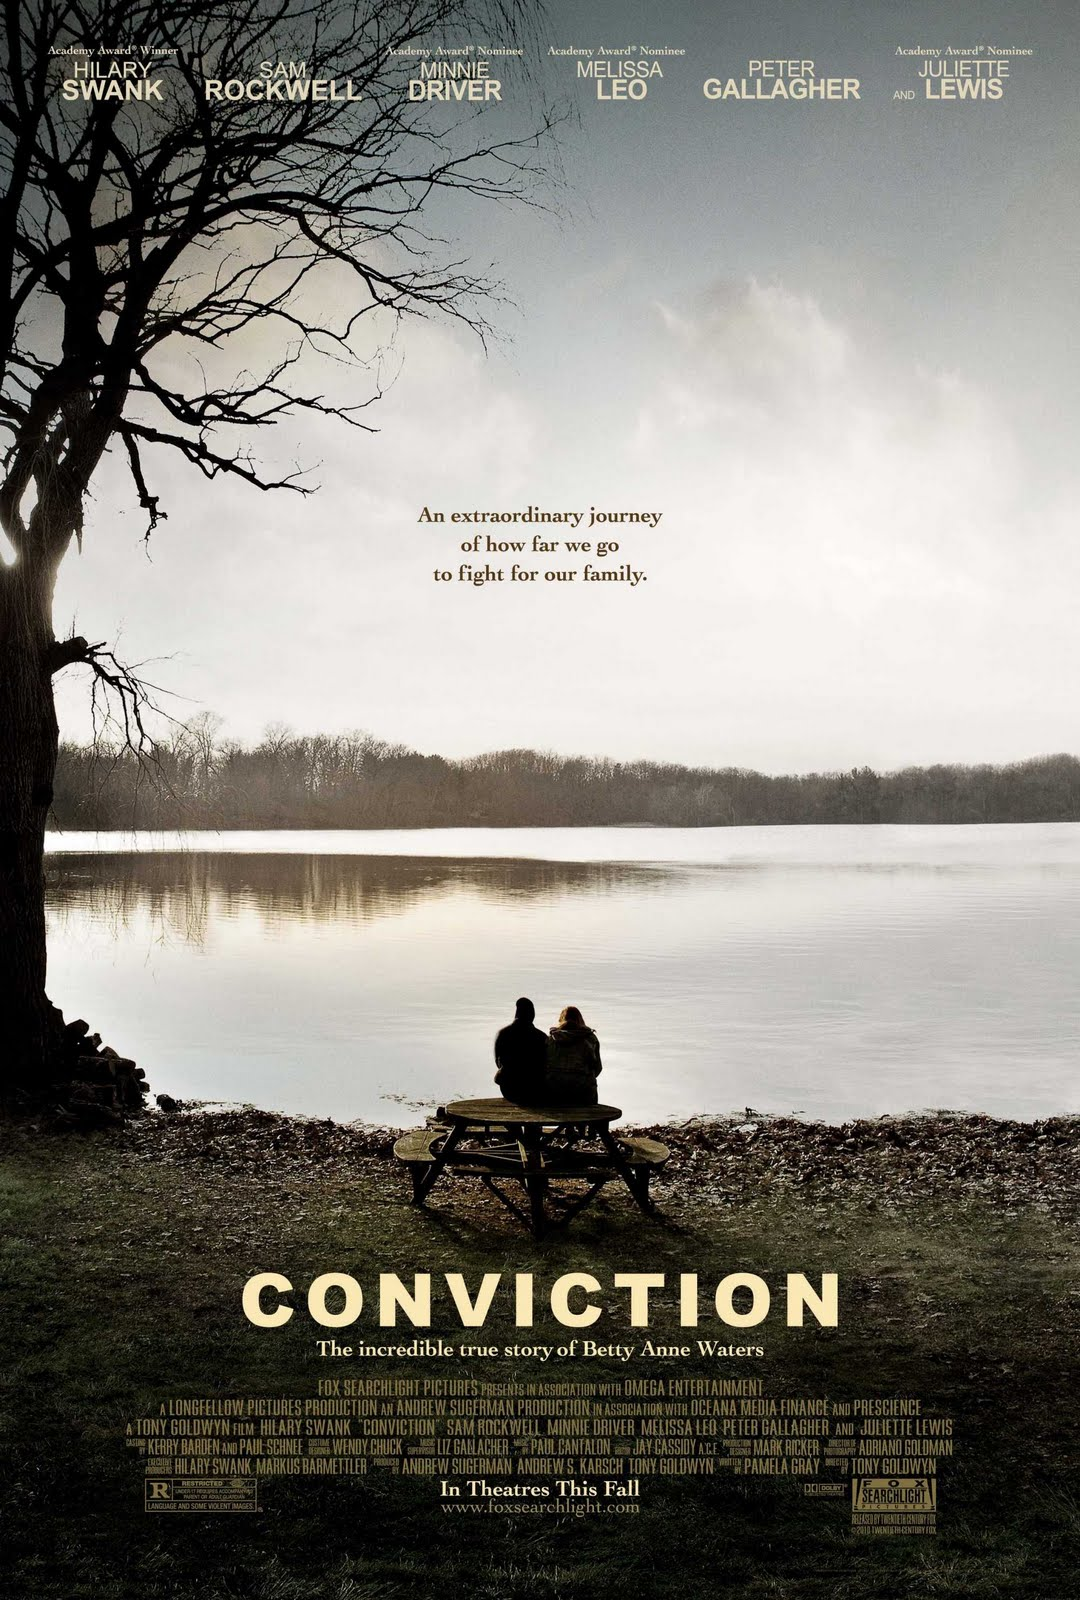 http://3.bp.blogspot.com/_9sOVBlwc70I/TULWSF5a3OI/AAAAAAAAAJ0/1JNWho6EPRA/s1600/Conviction-Movie-Poster-Sam-Rockwell-Hillary-Swank.jpg